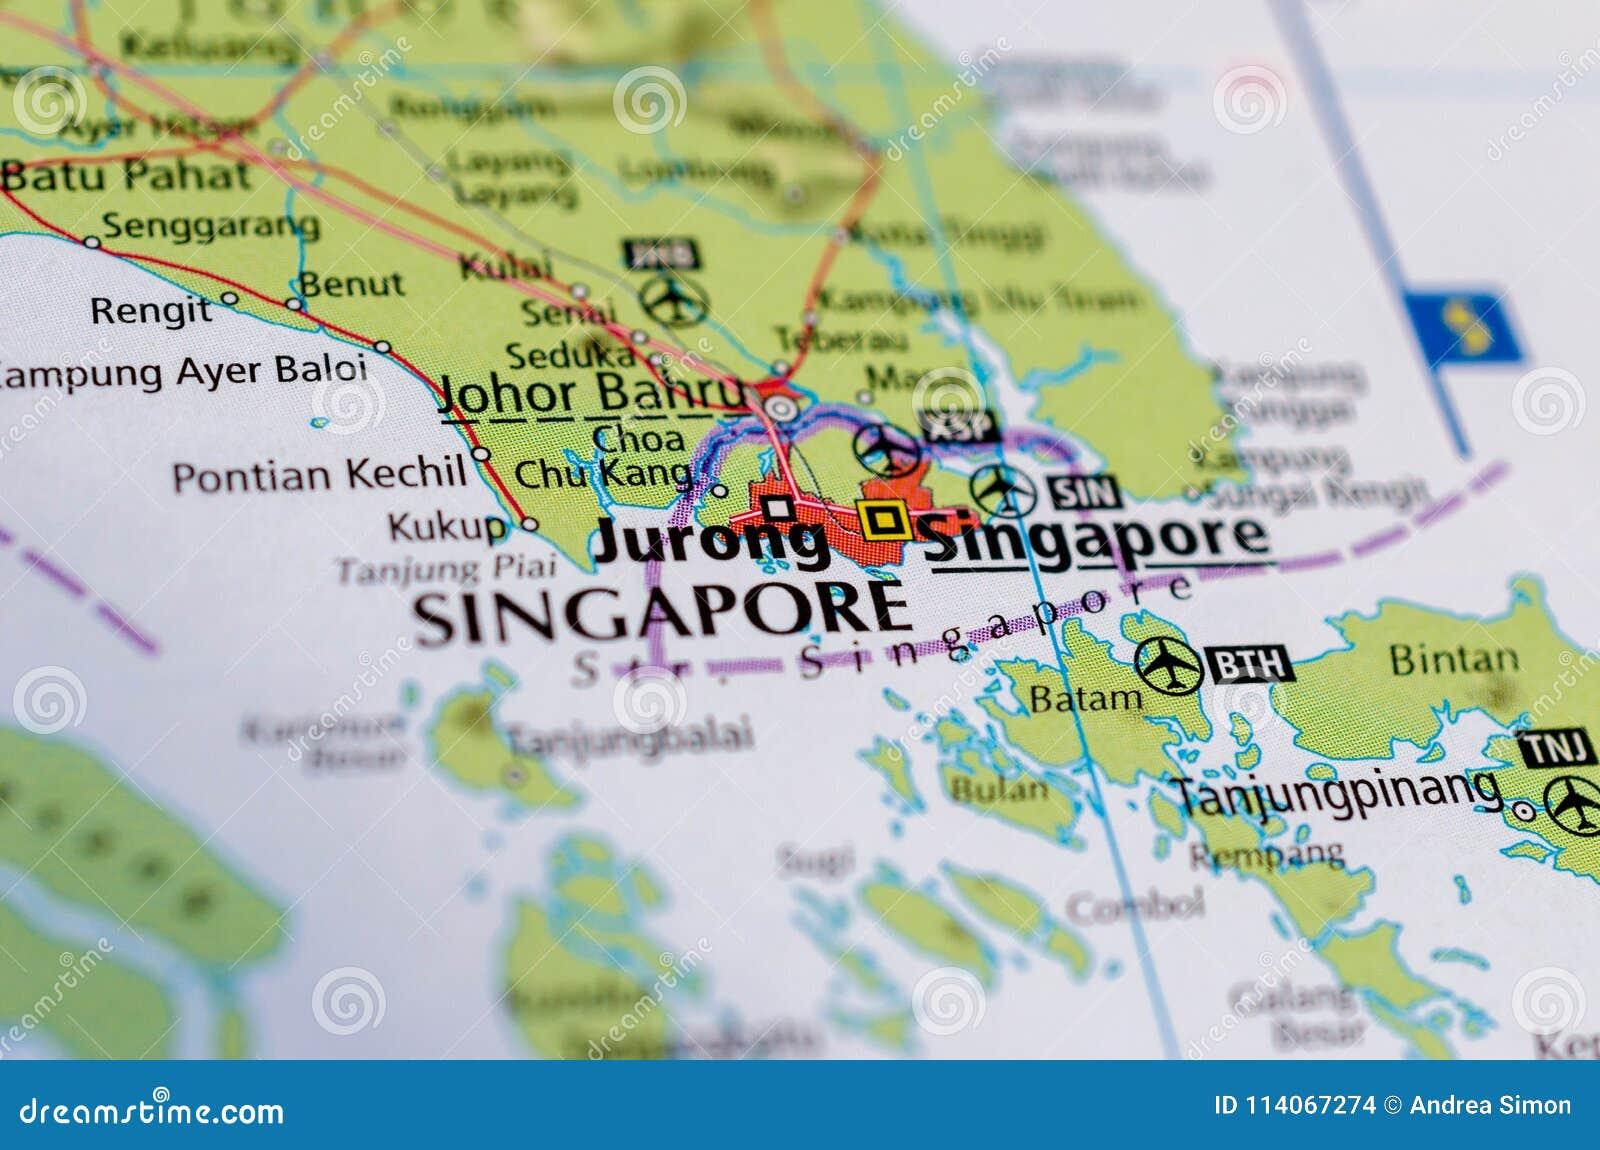 Map Of Asia Showing Singapore.Singapore On Map Stock Photo Image Of Citystate Singapore 114067274